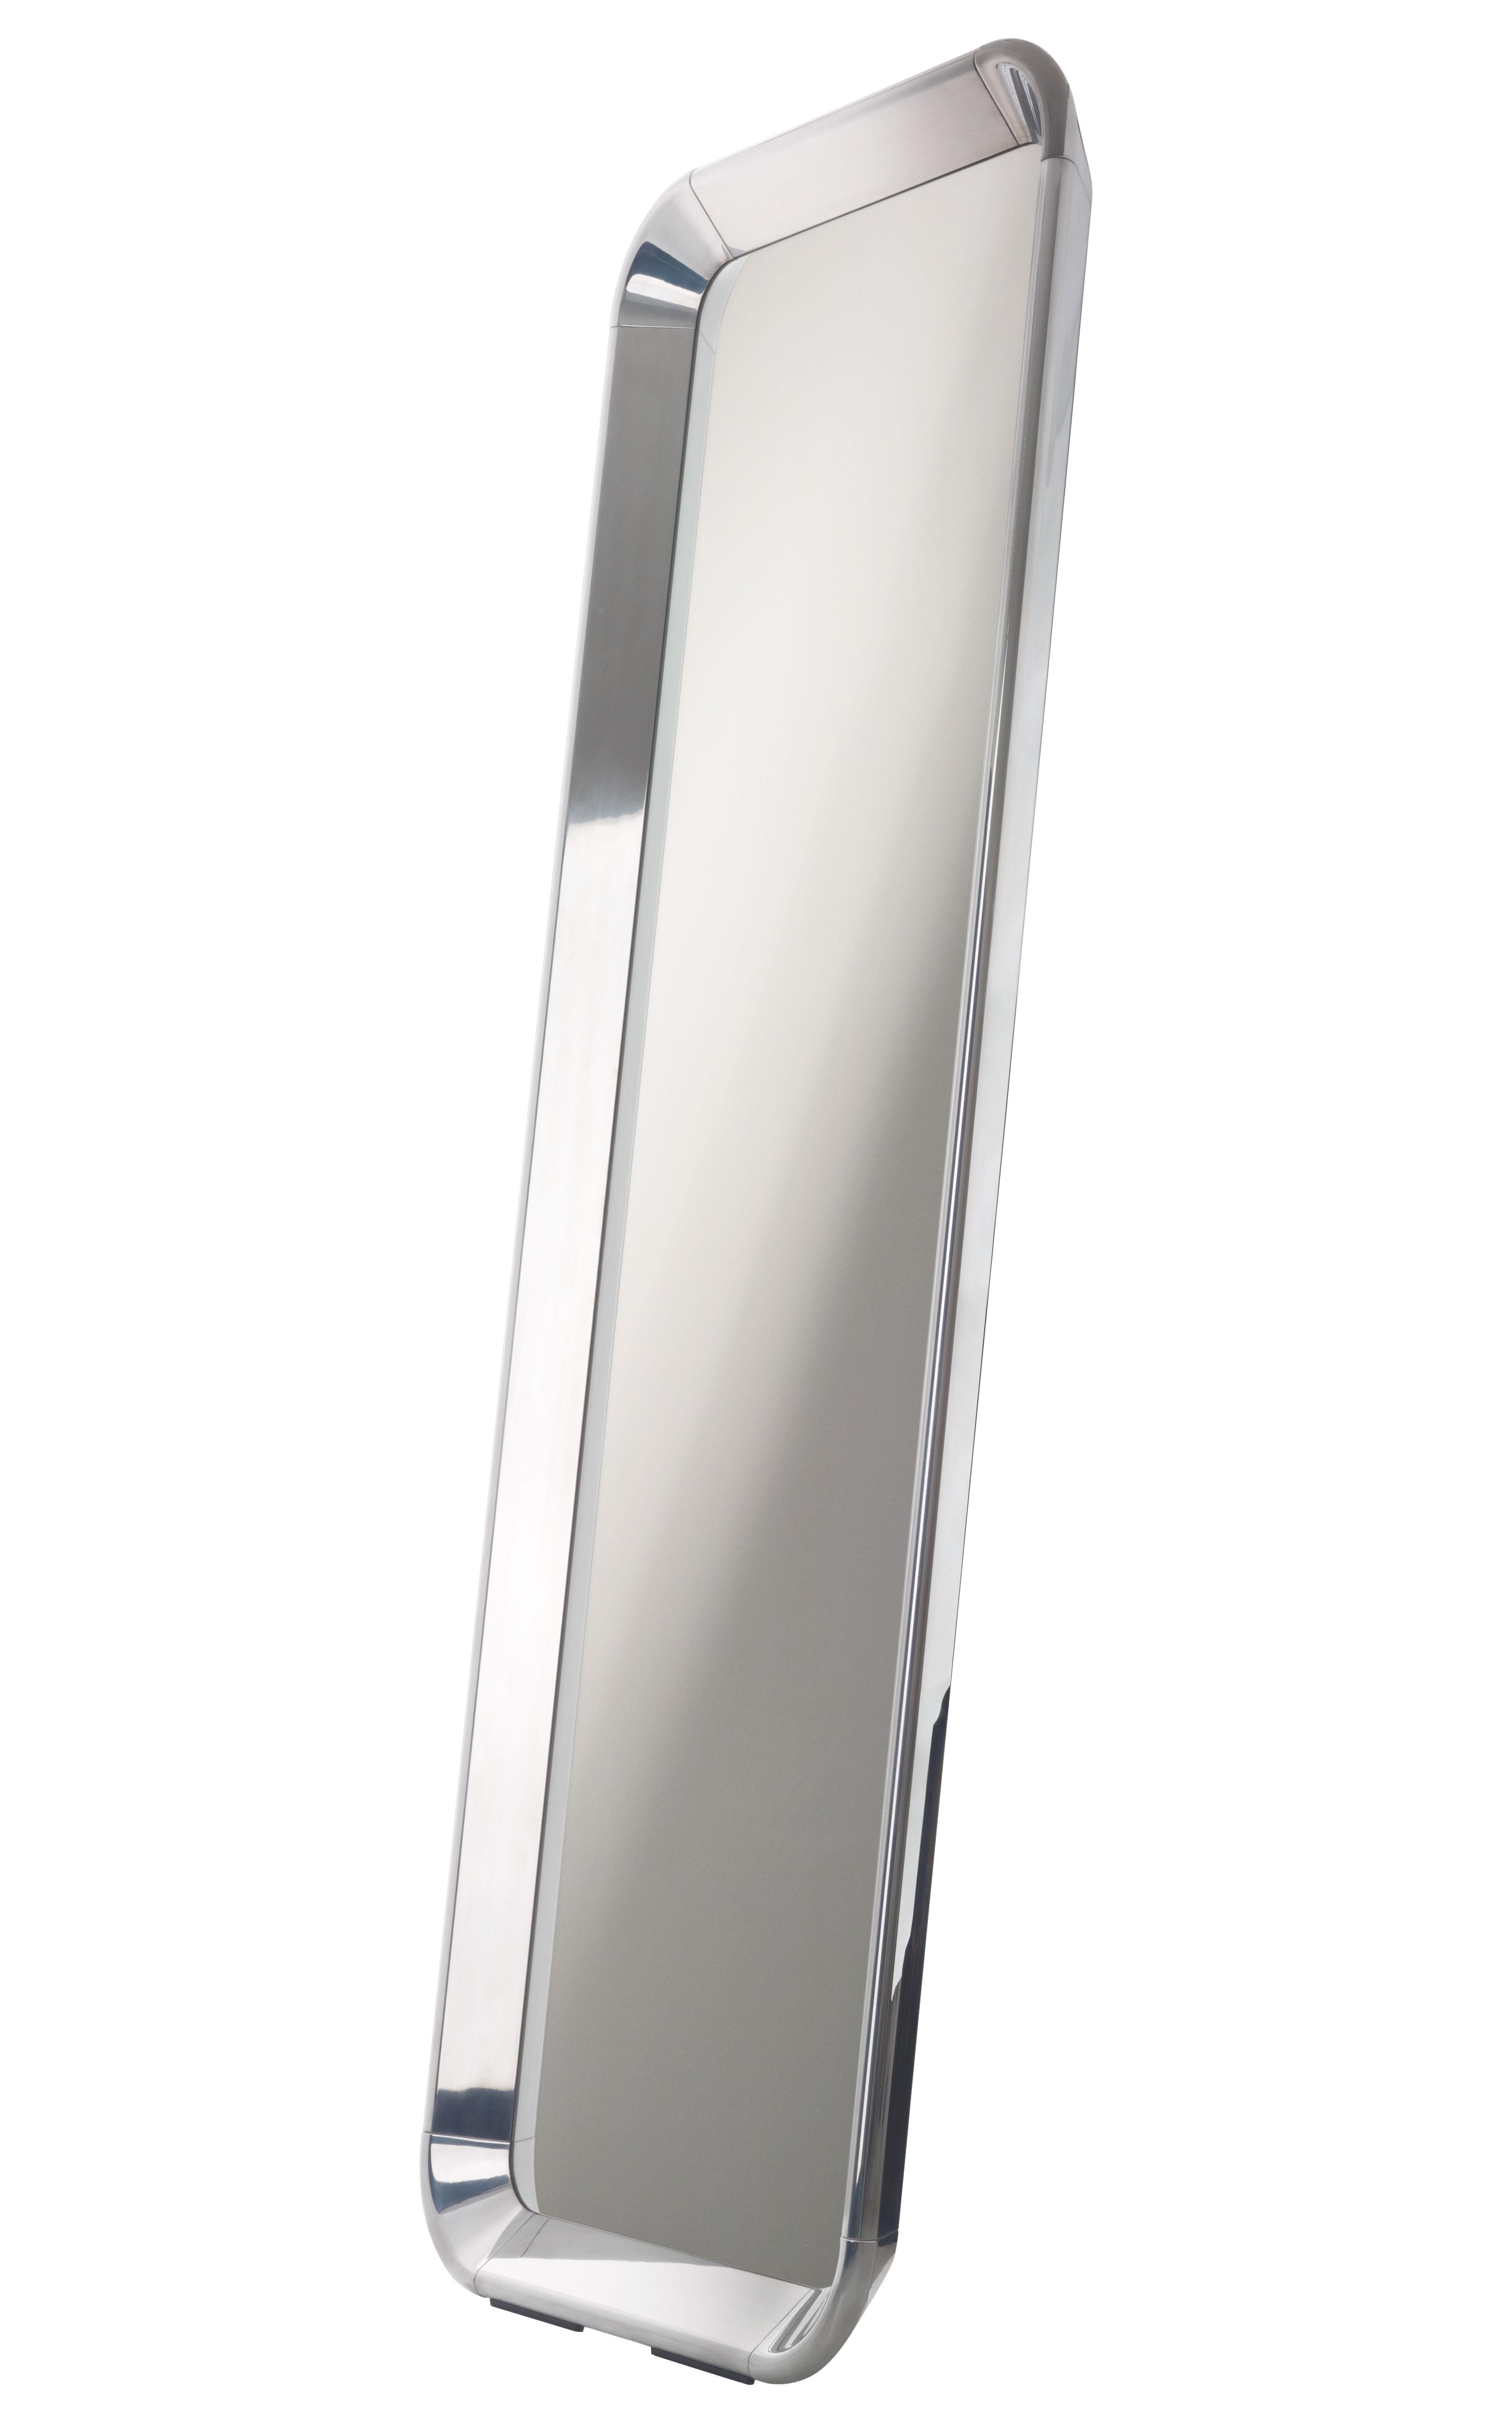 Möbel - Spiegel - Déjà-vu Spiegel 190 x  73 cm - Magis - Aluminium -  190 x 73 cm - poliertes Aluminium